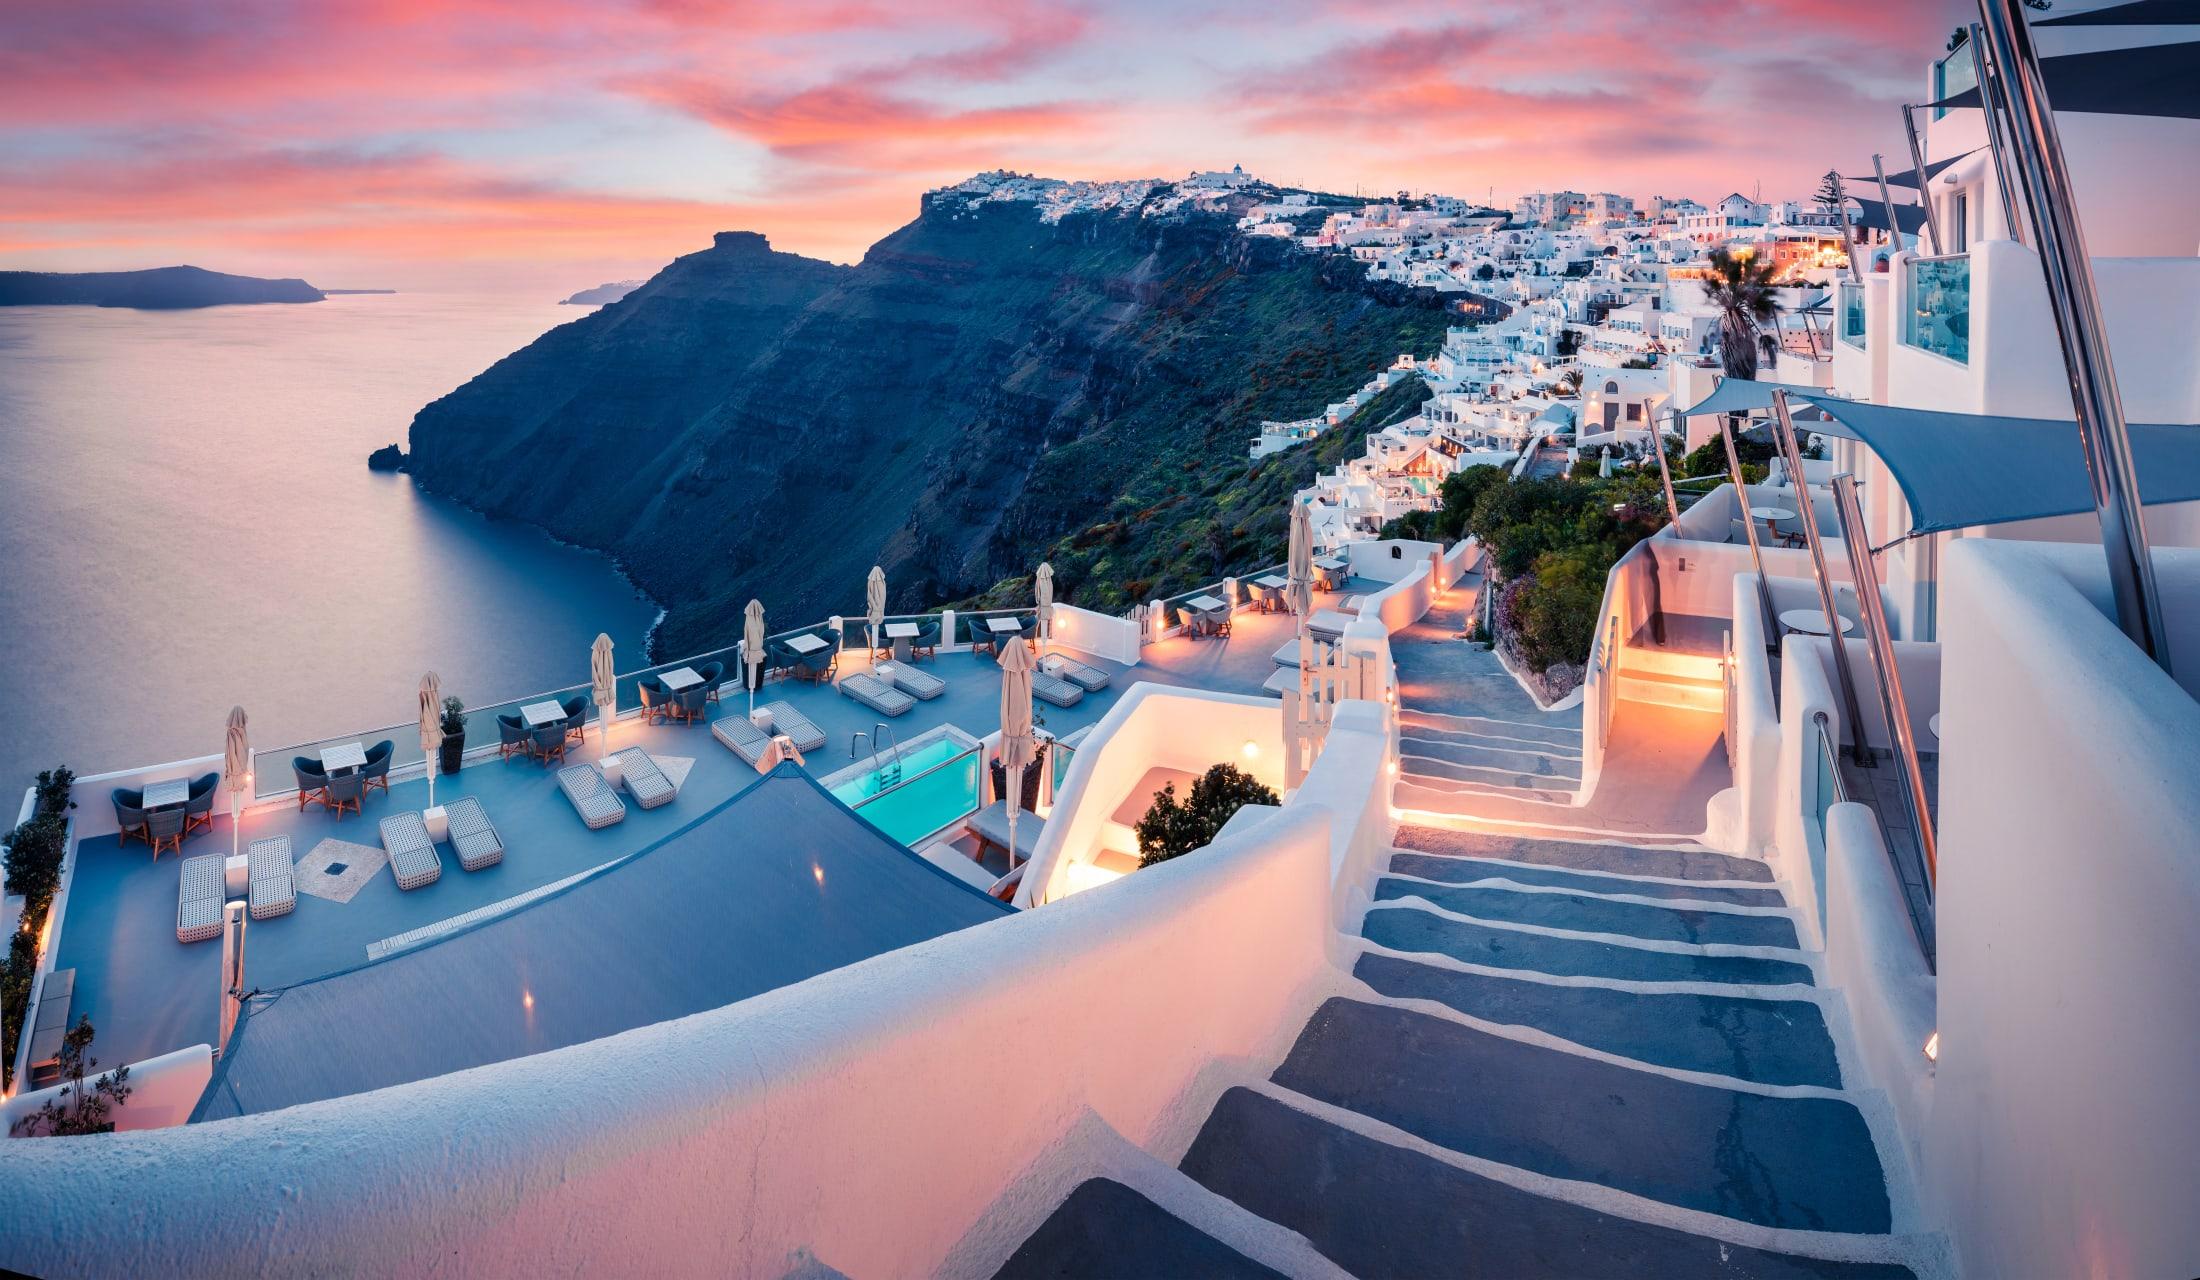 Santorini - Fira Santorini: The Heart and Soul of the Island During Sunset